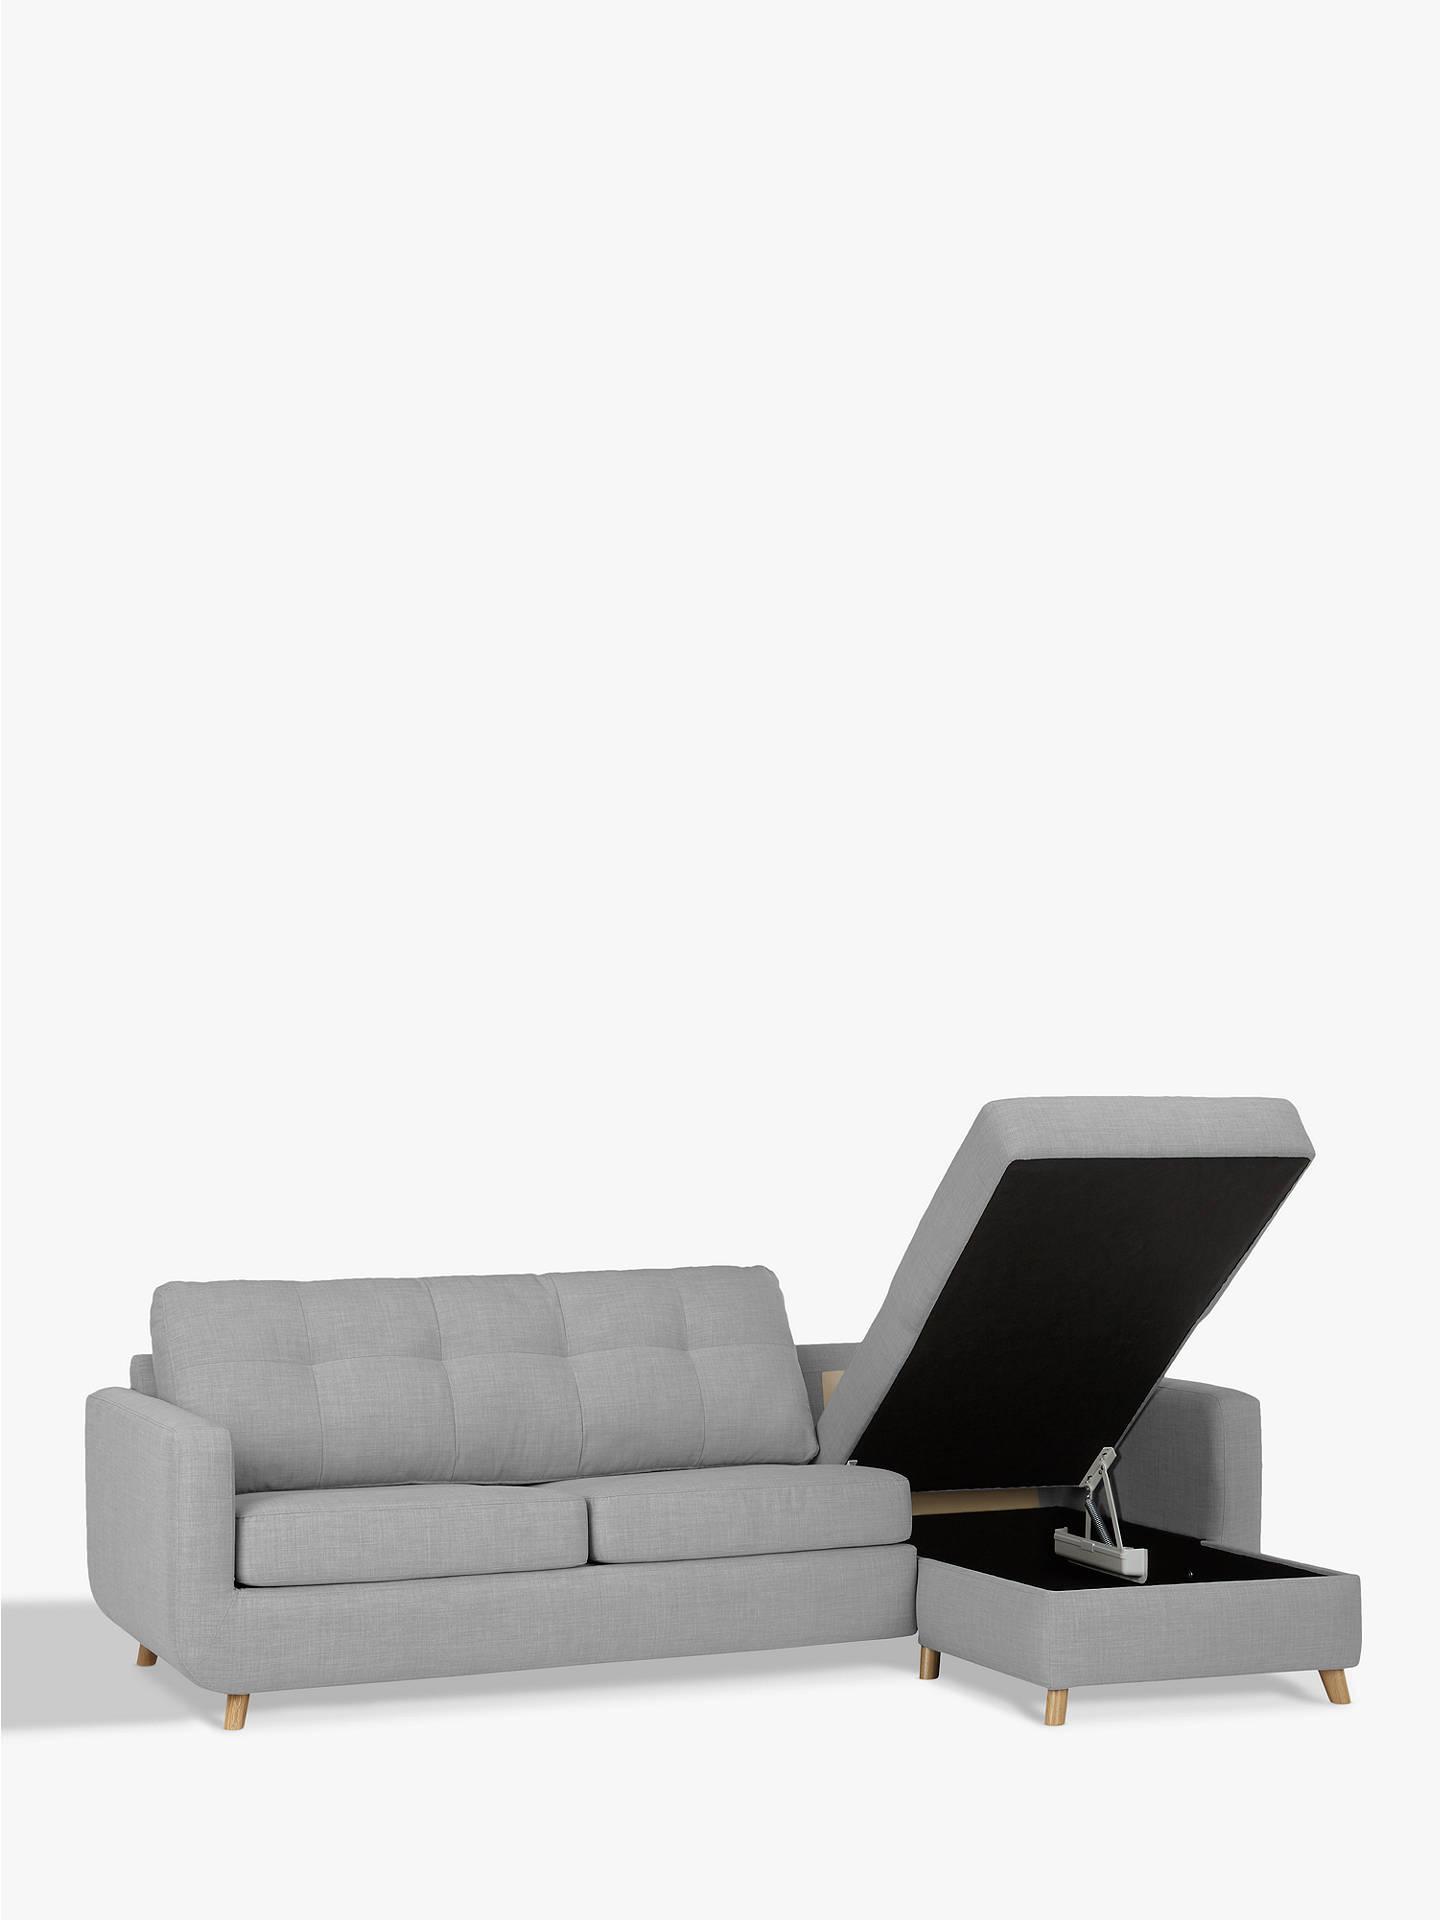 aw17 barbican chaise sofabedalt8